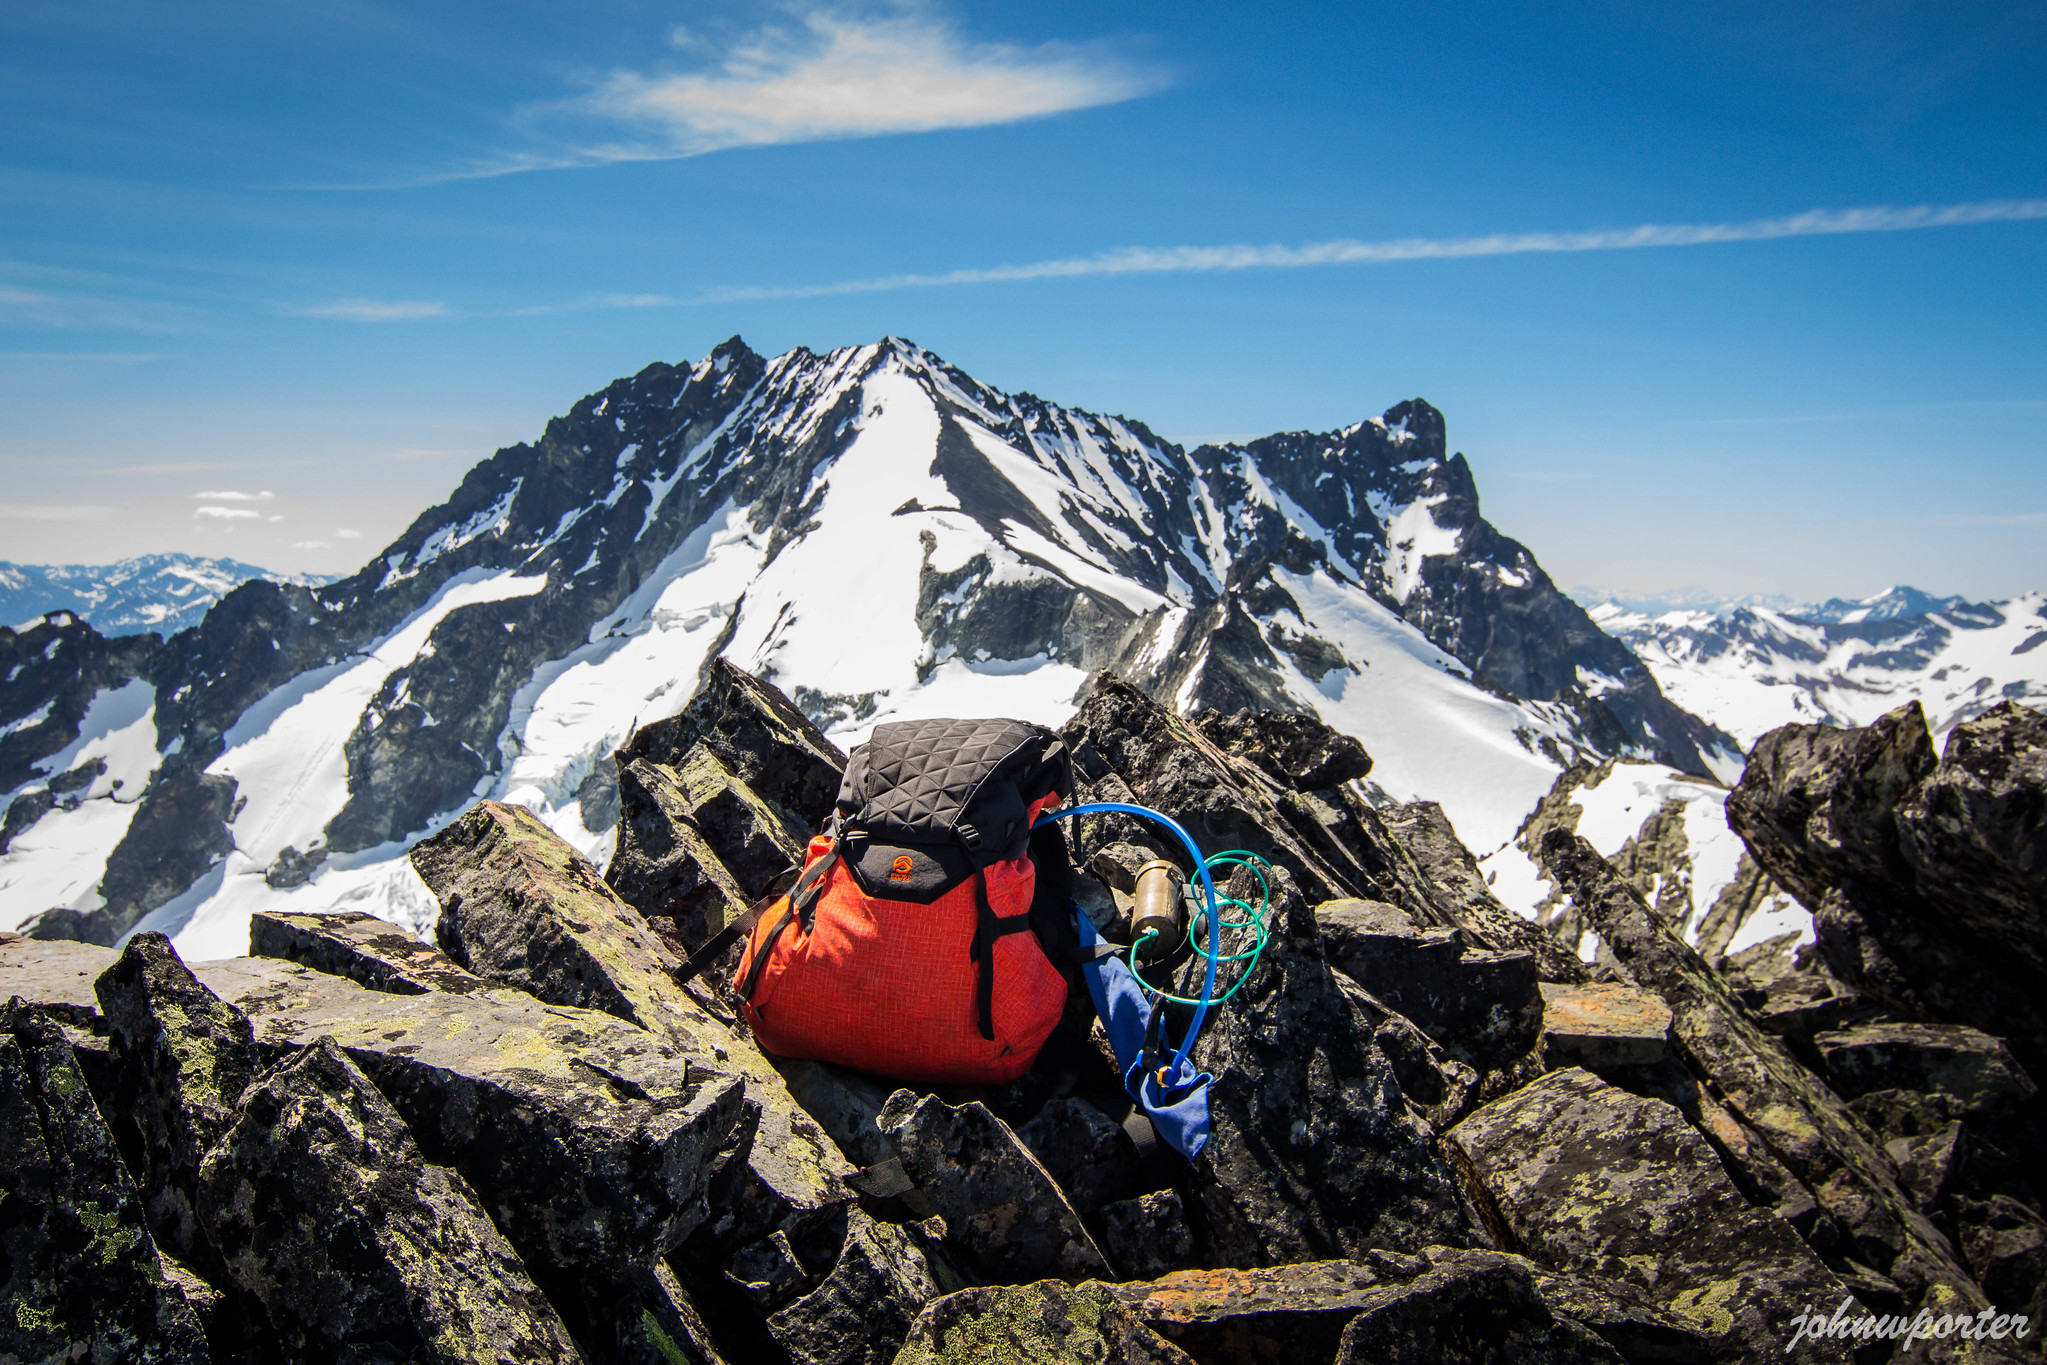 Summit bliss on Dark Peak